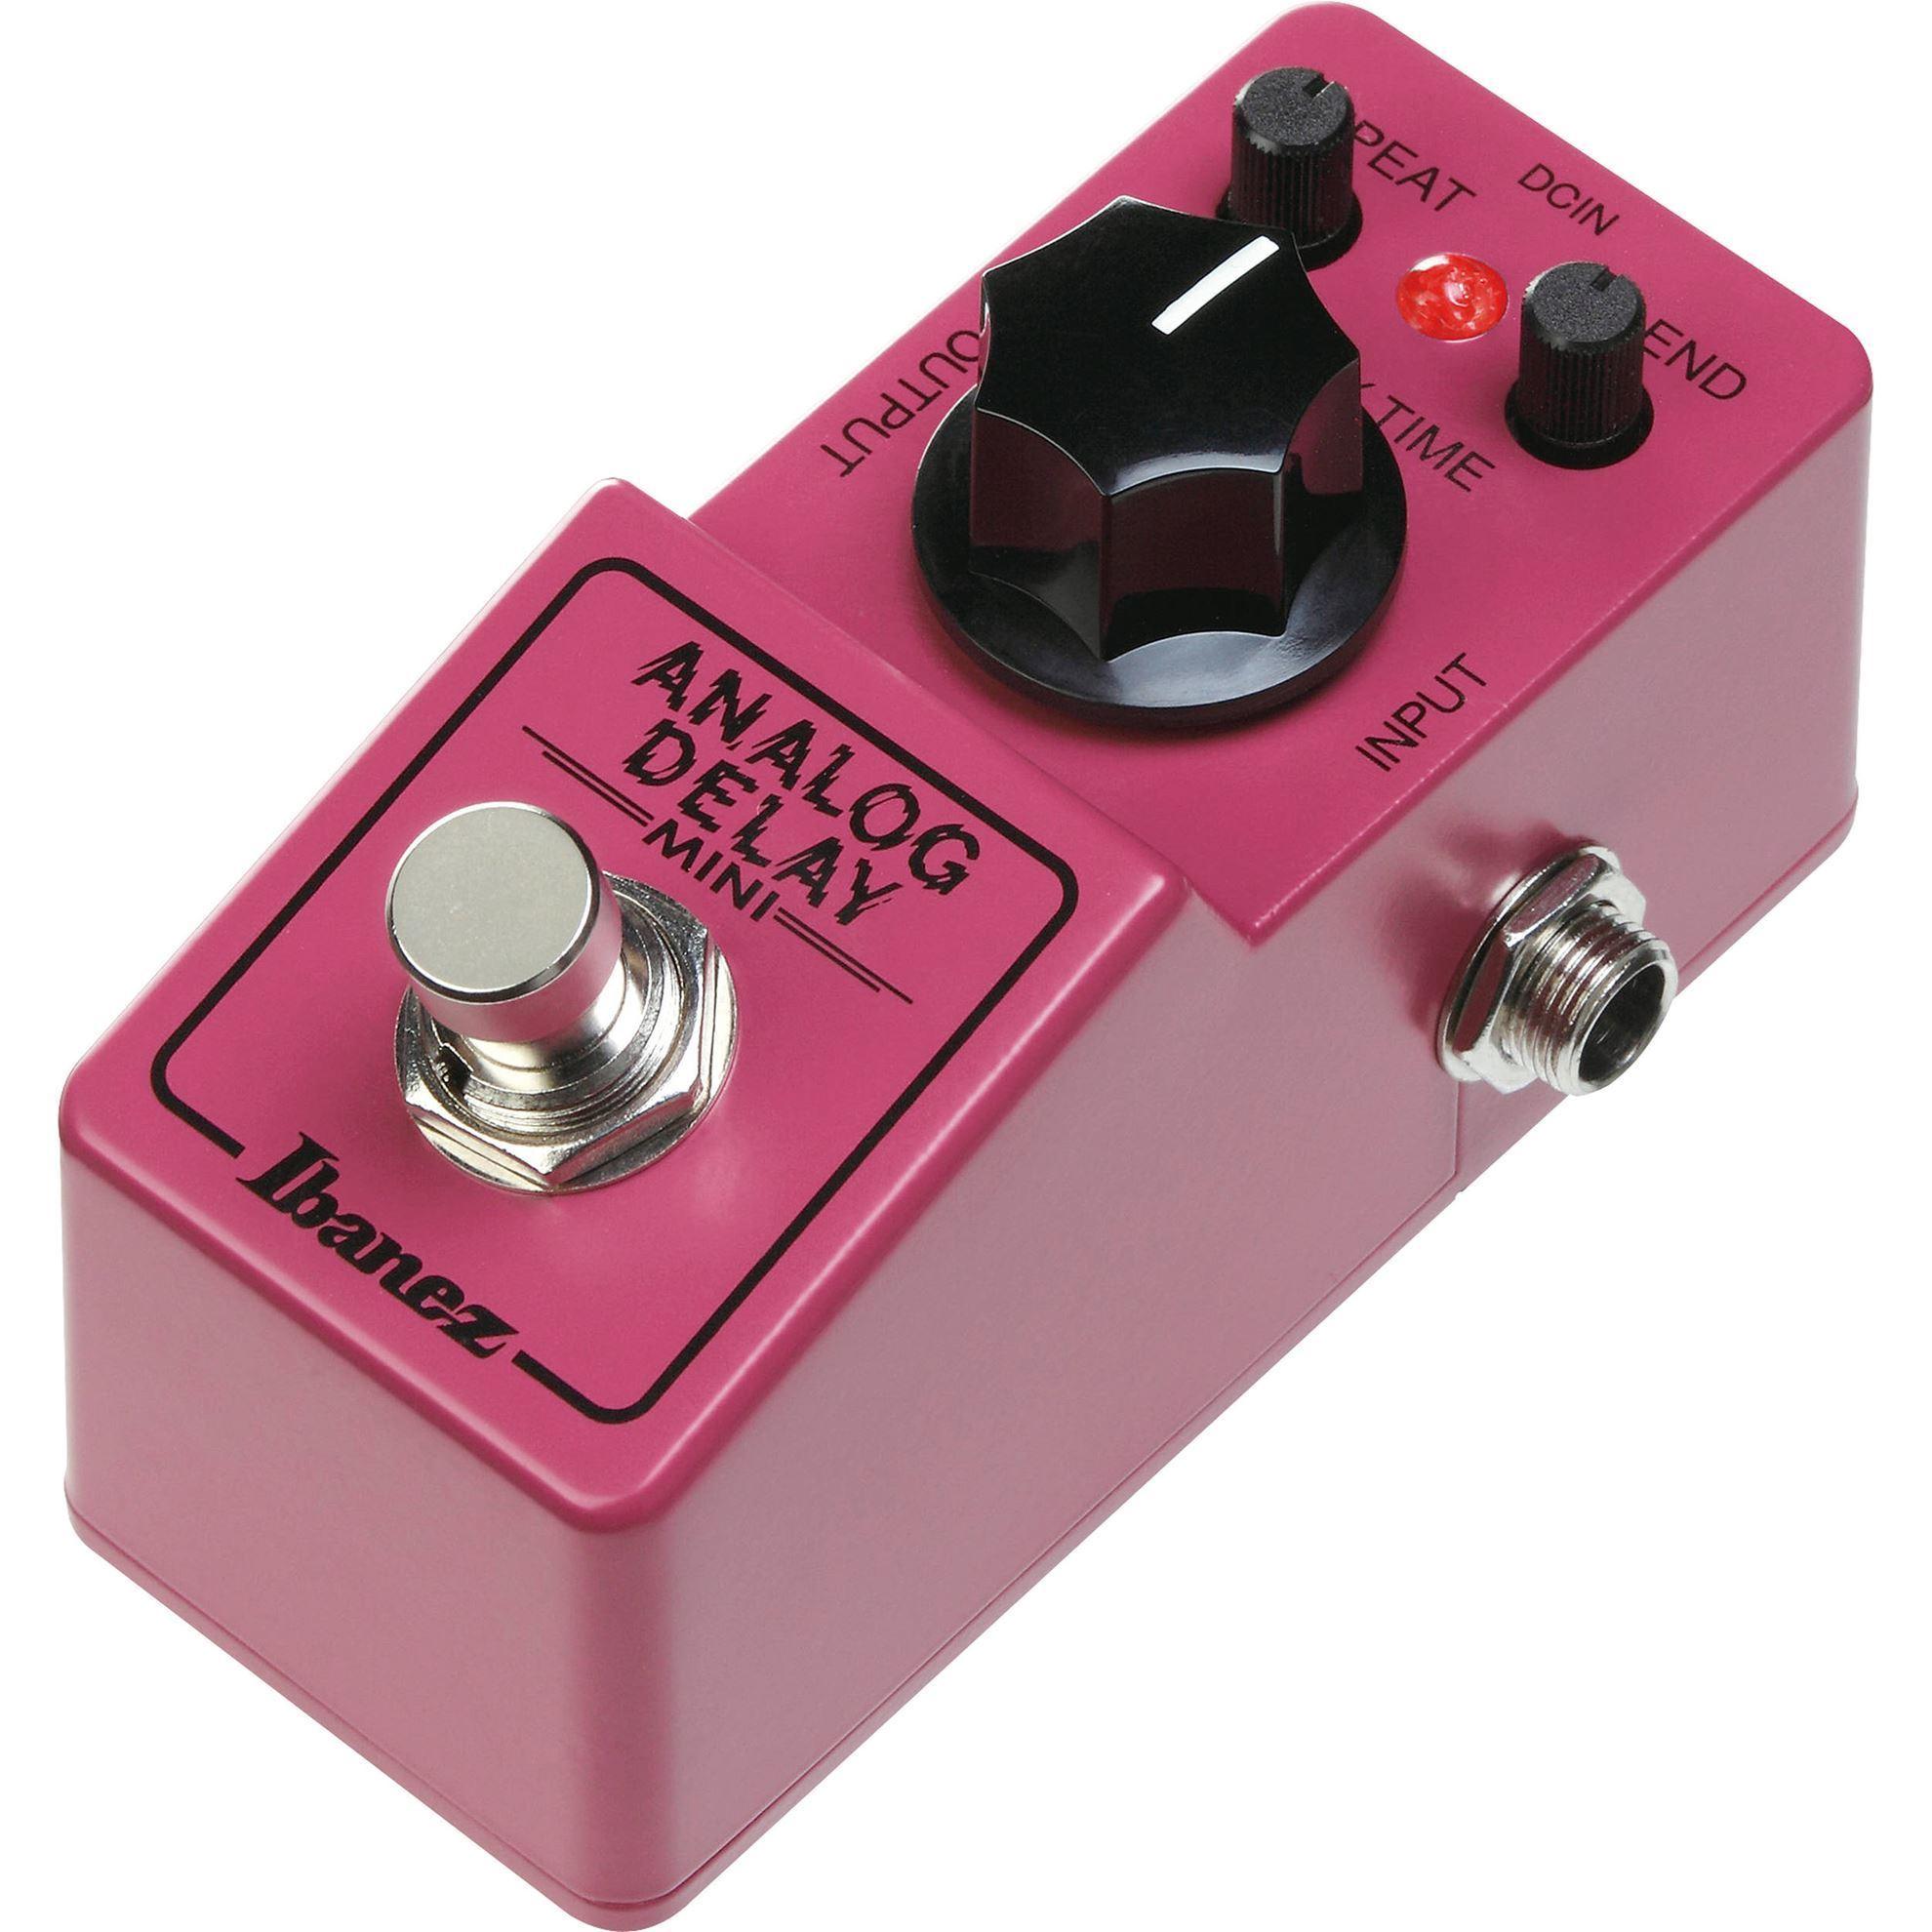 Ibanez ADMINI Analog Delay Mini Guitar Effects Pedal Side View